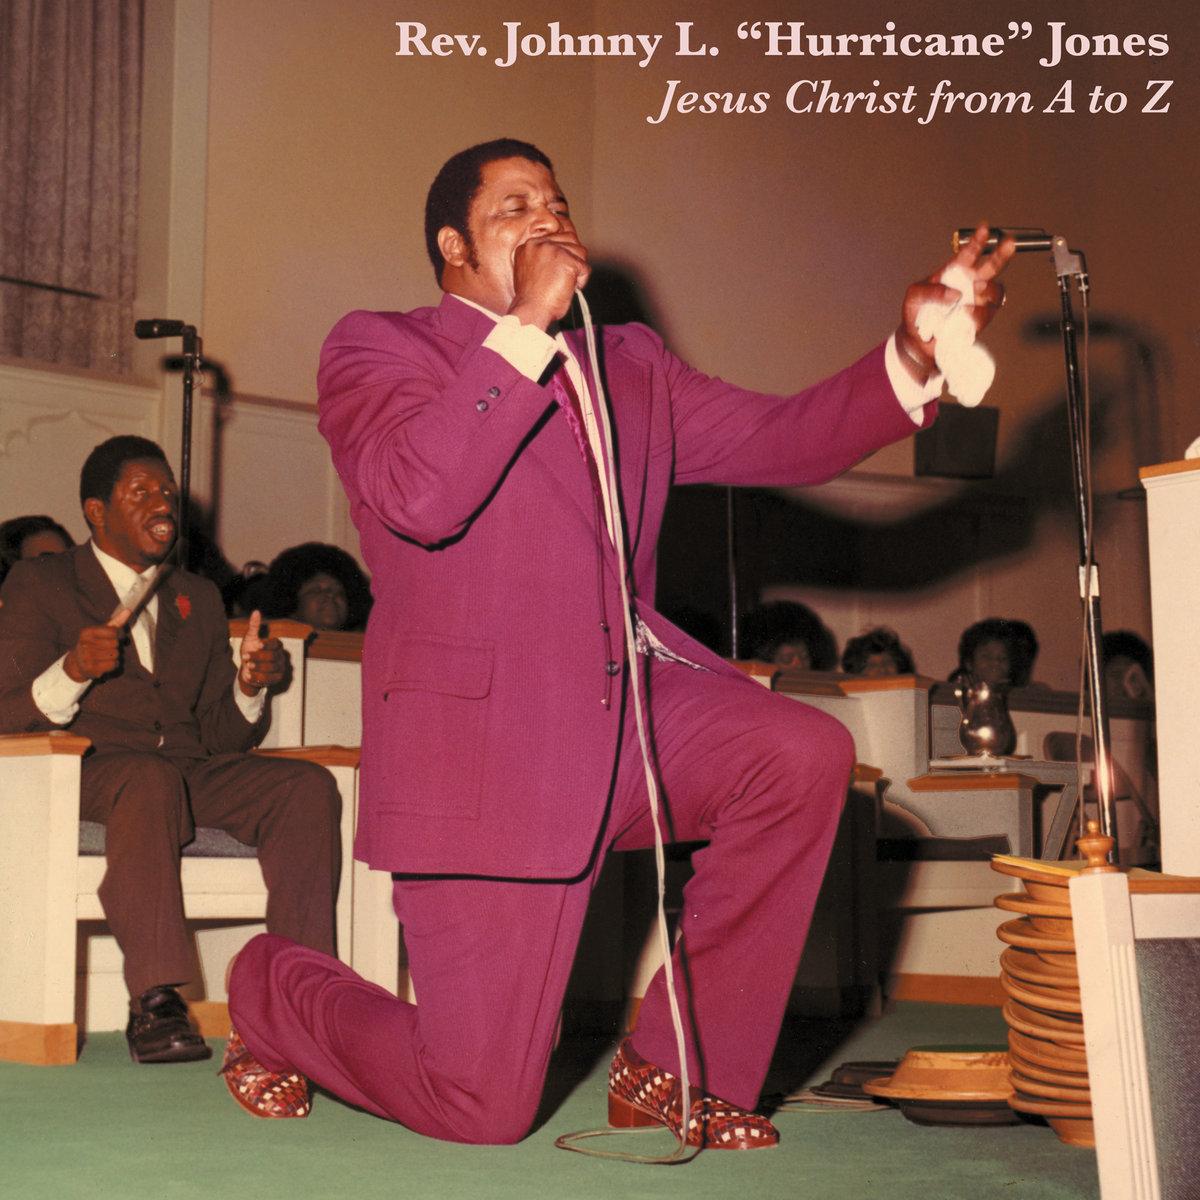 "Rev. Johnny L. ""Hurricane"" Jones - Jesus Christ from A to Z  Release Date: December 17, 2009 Label: Parlortone/Dust-to-Digital  SERVICE: Restoration, Mastering SOURCE MATERIAL: 1/4"" Tape, Cassette NUMBER OF DISCS: 1 GENRE: Gospel FORMAT: LP"